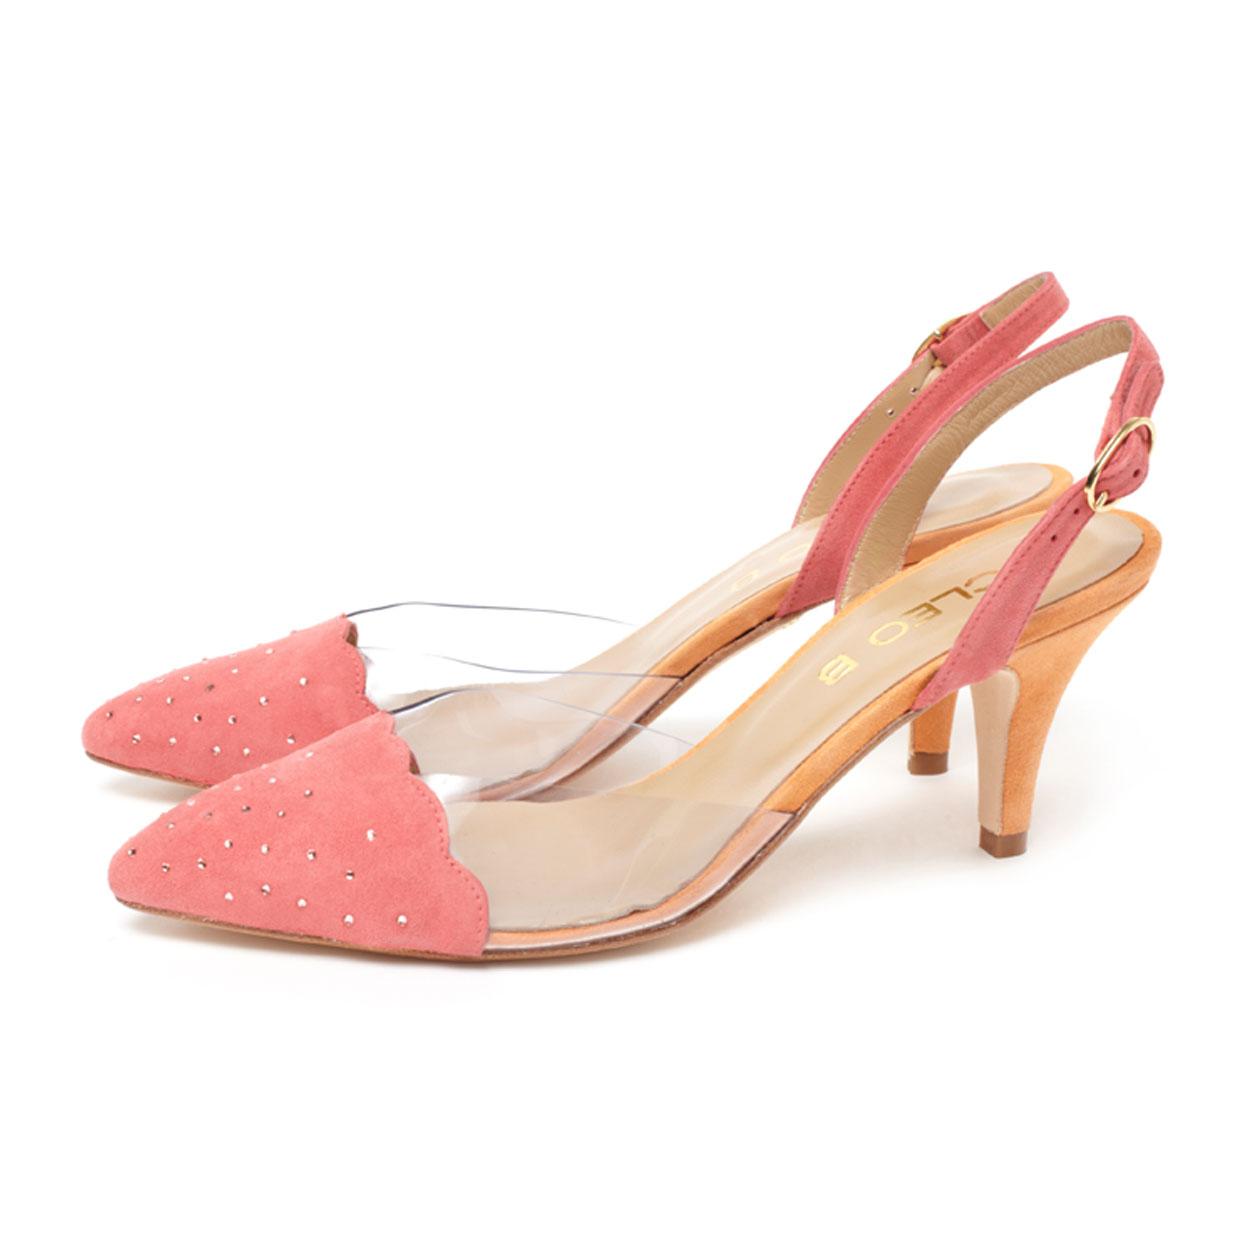 Ringo_pink_pair_kitten_heel_cleo_b_shoes_london_web.jpg